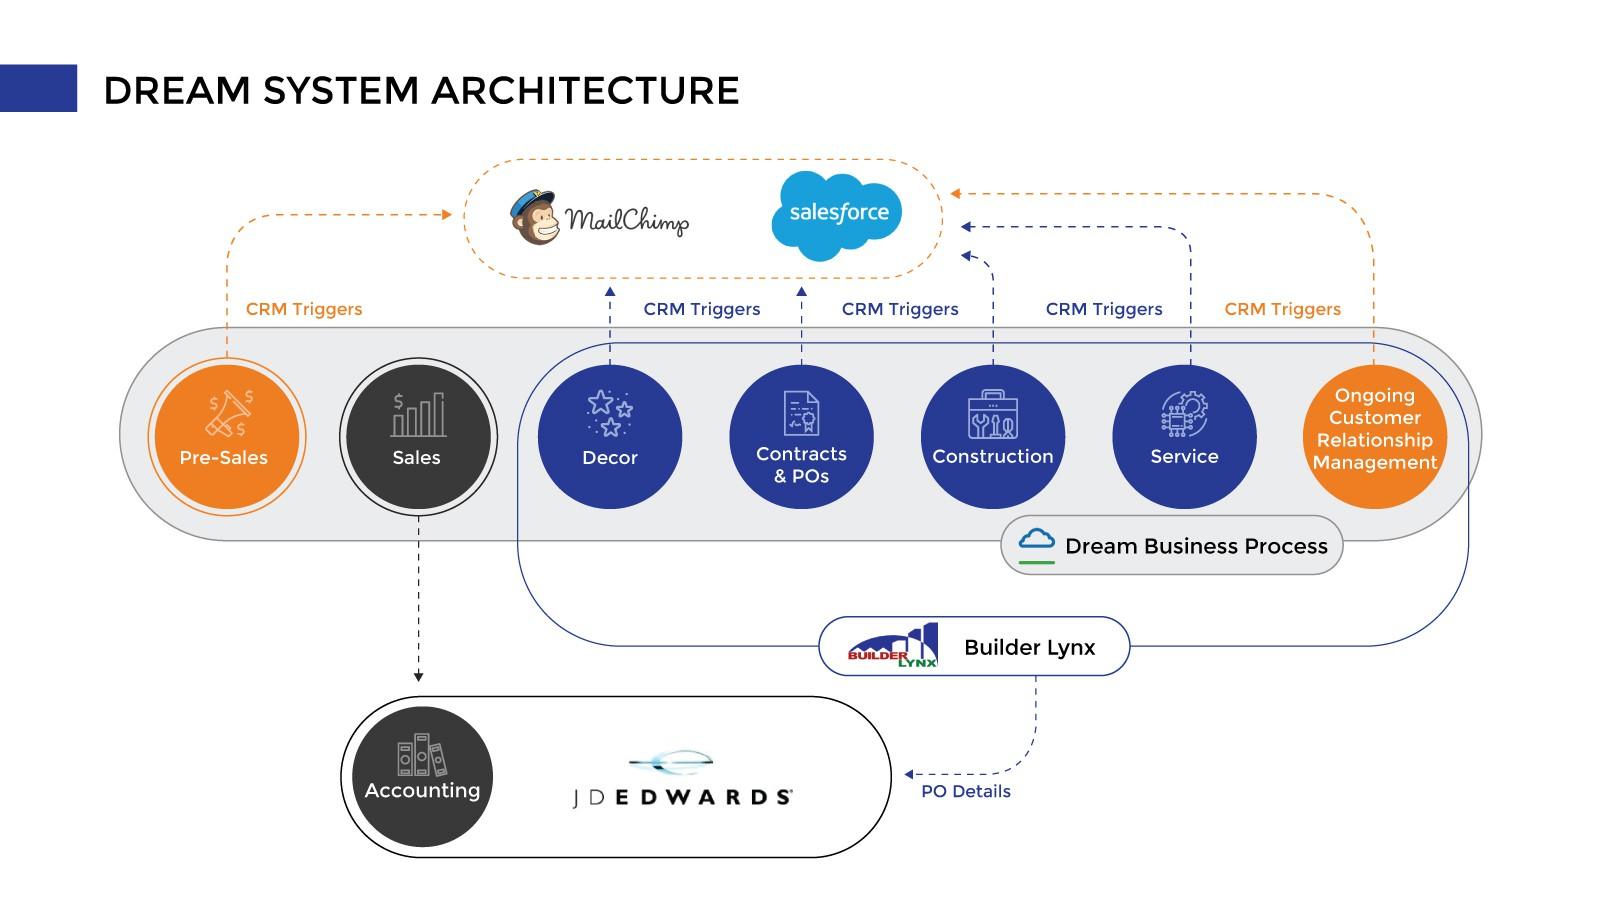 Dream System Architecture